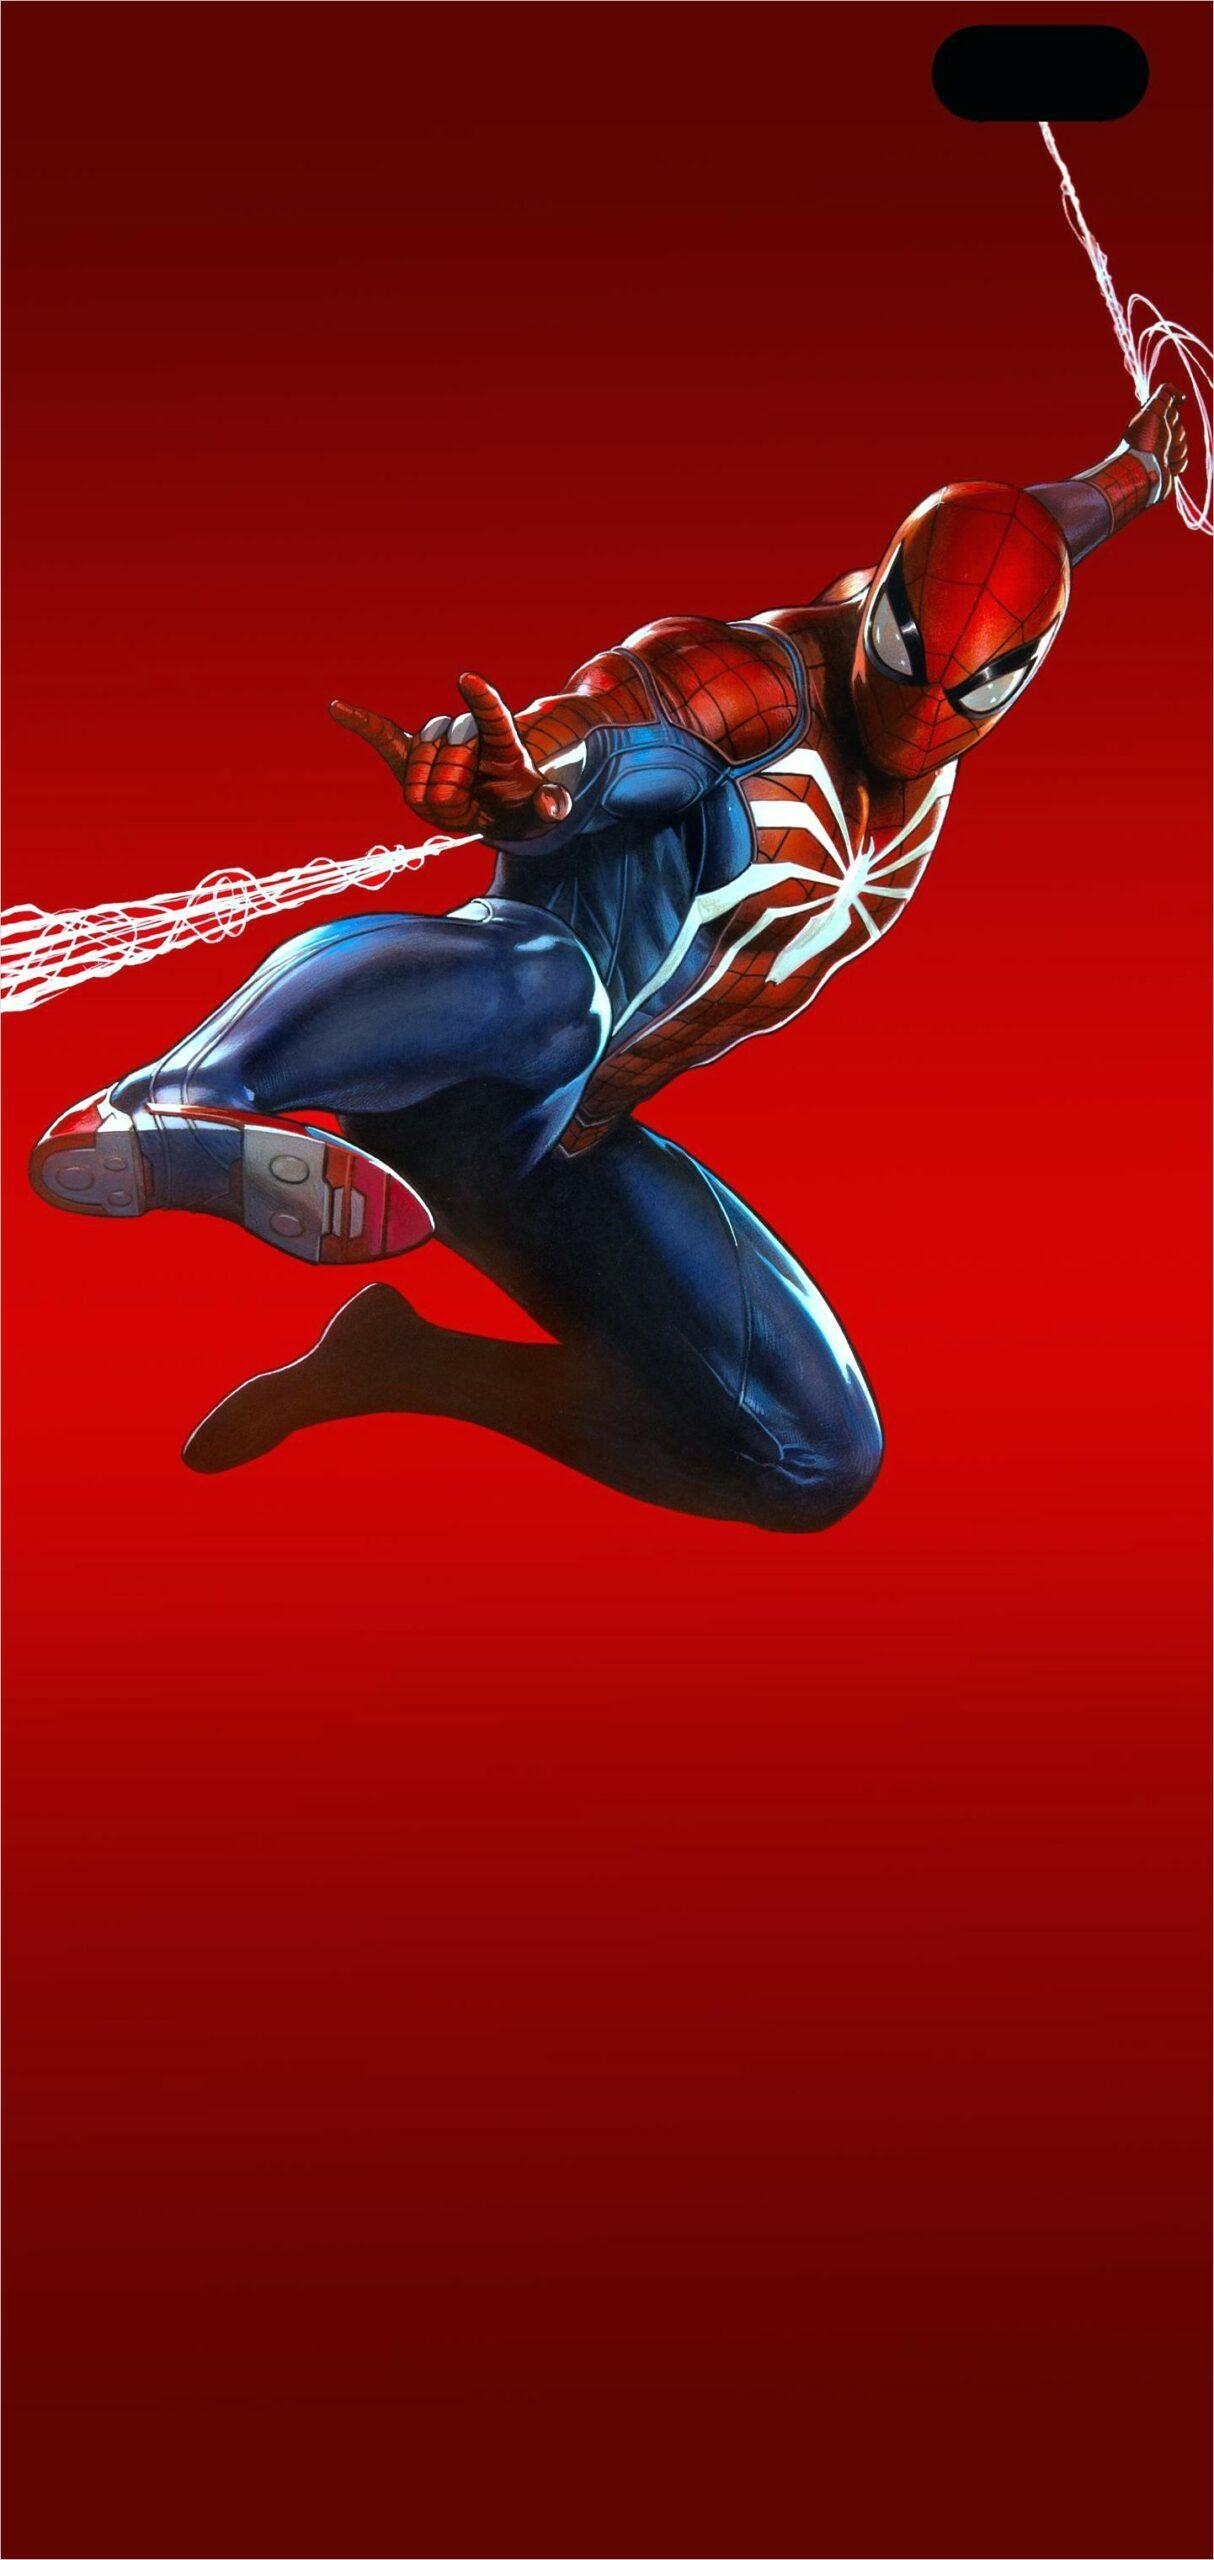 4k Galaxy S10 Plus Spiderman Wallpaper In 2020 Marvel Canvas Art Marvel Canvas Superhero Wallpaper